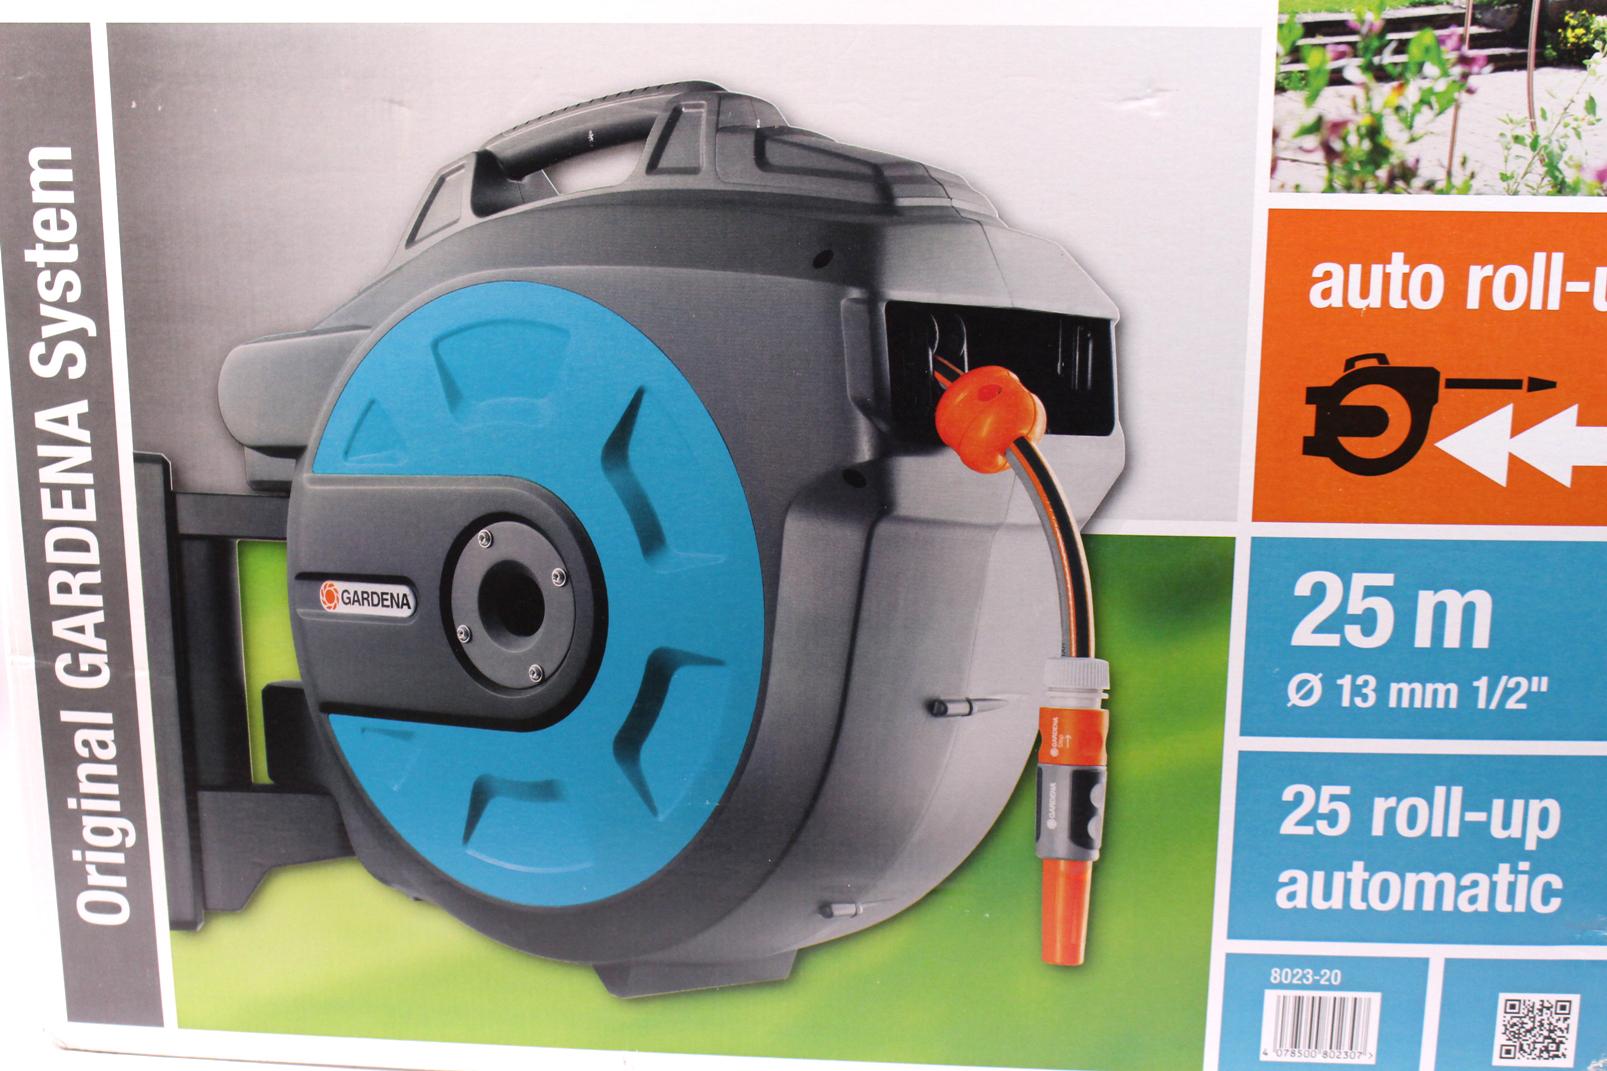 gardena 25 roll up automatic wand schlauchbox schlauch. Black Bedroom Furniture Sets. Home Design Ideas